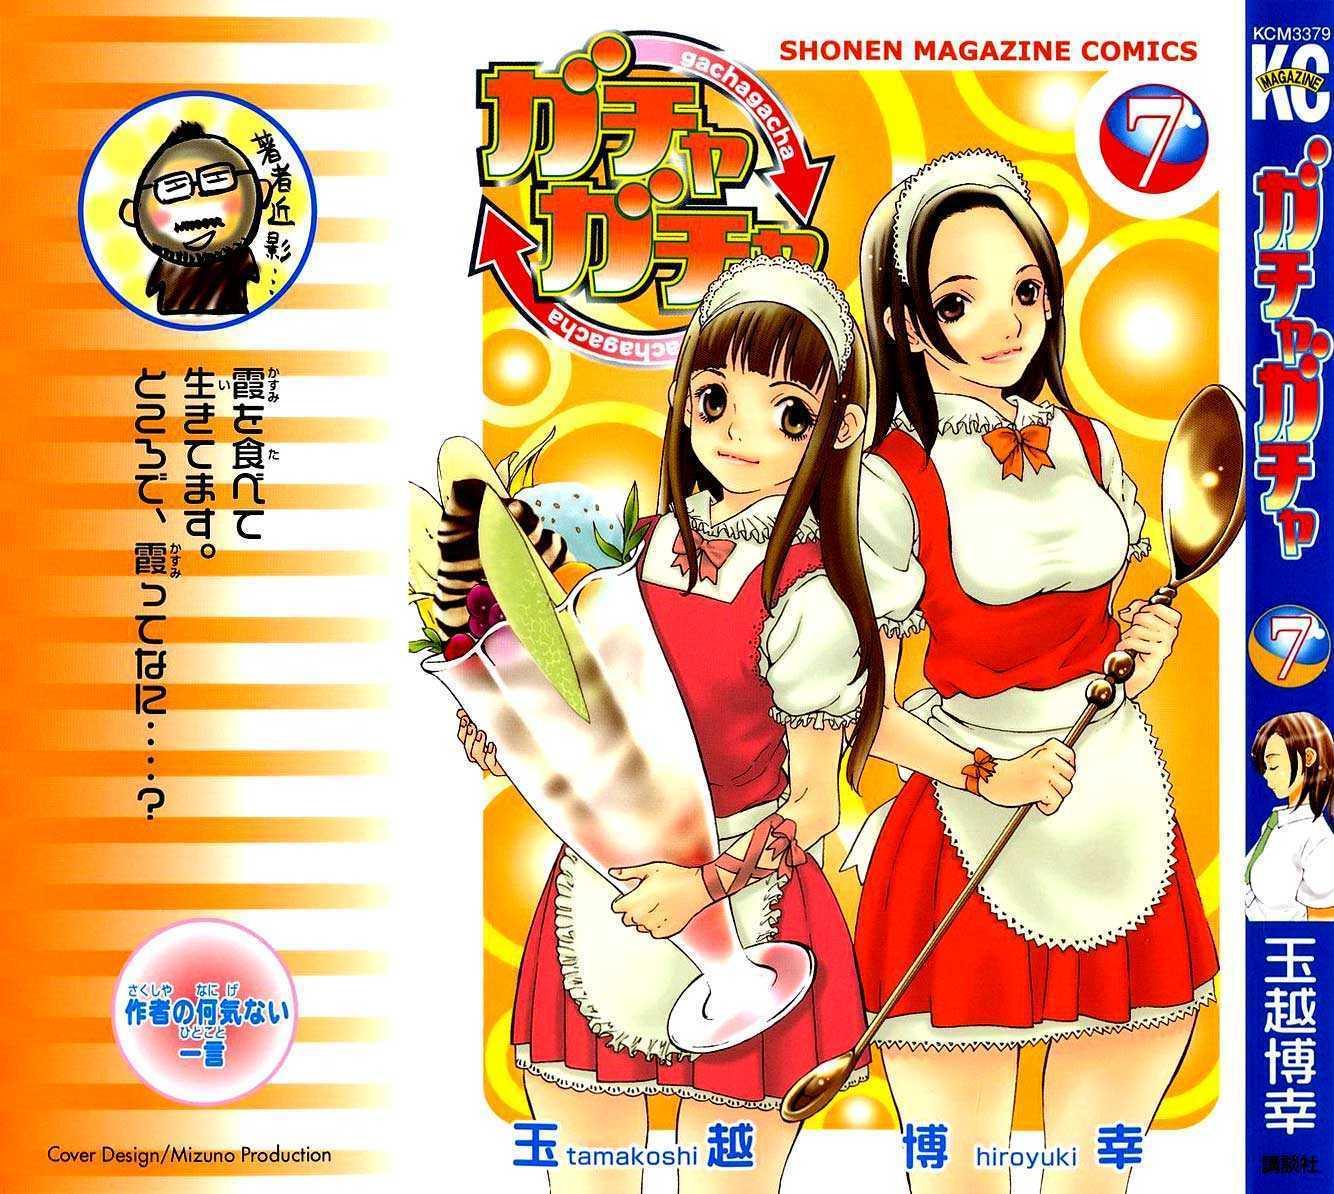 Gacha Gacha 6: Sweet Xmas Dream at MangaFox